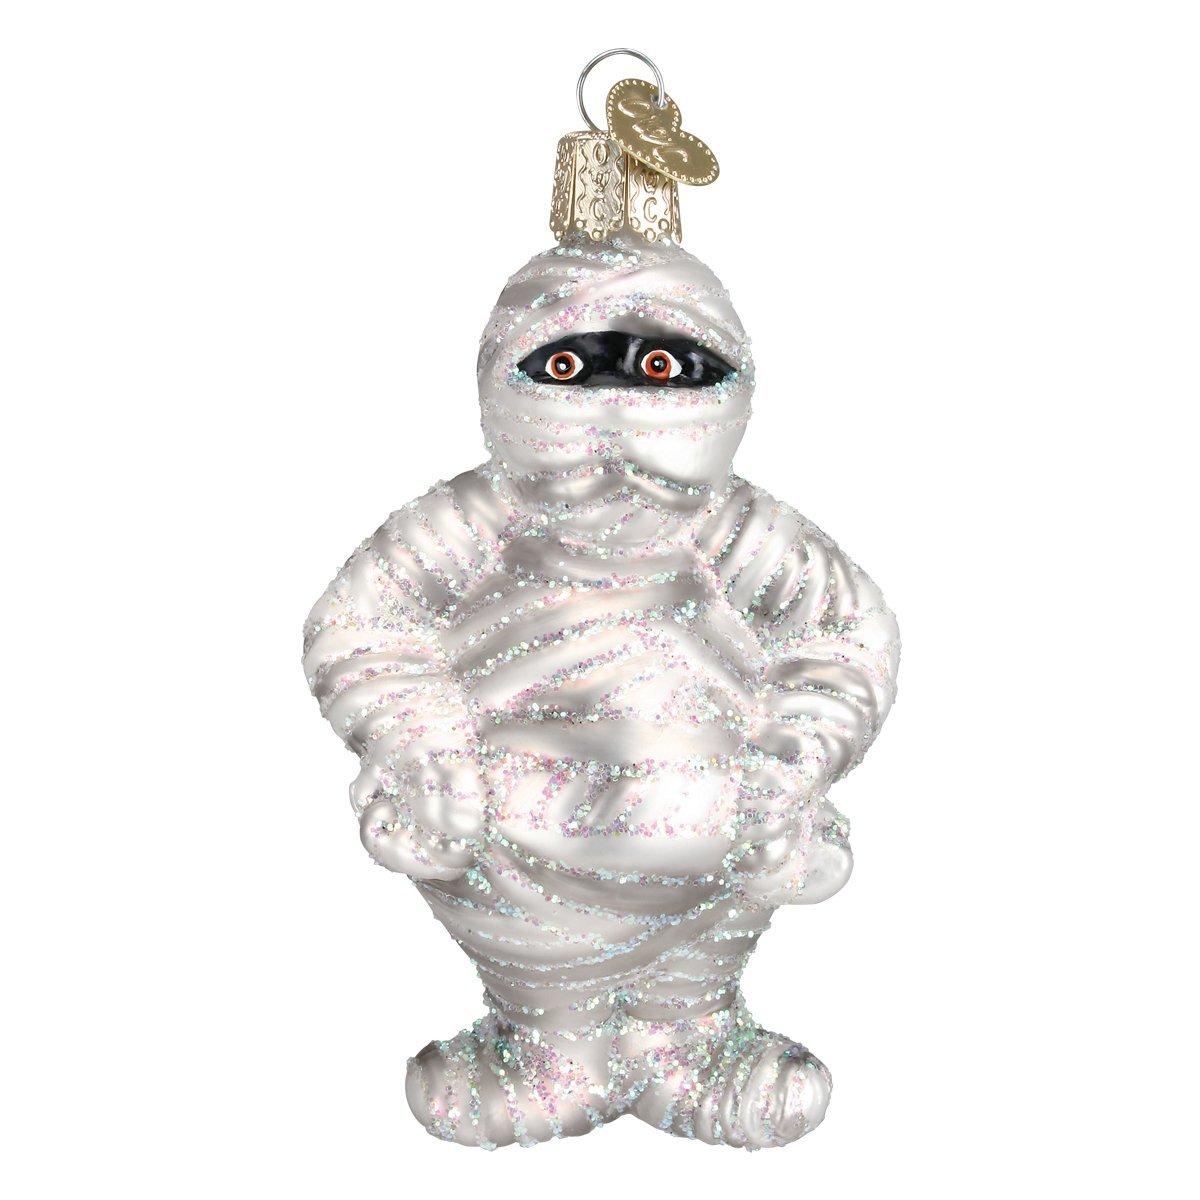 Amazon.com: Old World Christmas Mummy Glass Blown Ornament: Home ...